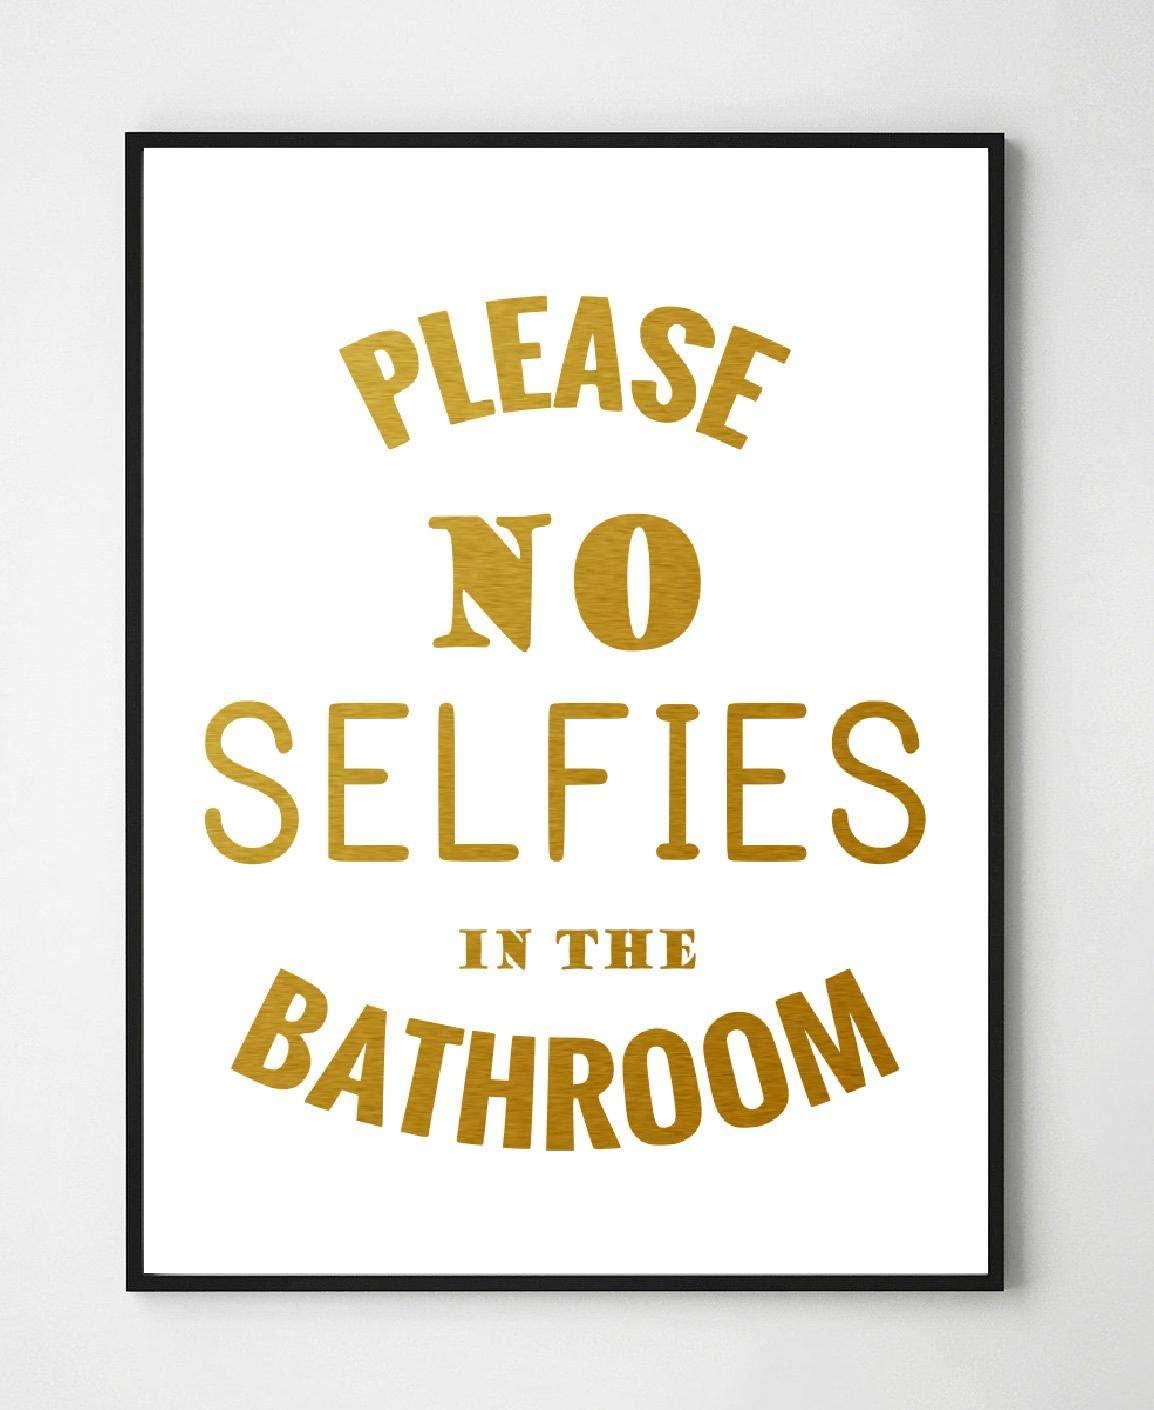 Turnip Designs No Selfies in The Bathroom 8X10 Unframed Funny Motivational Inspirational Office Home Gold Foil Art Print Wall Decor TDGF40